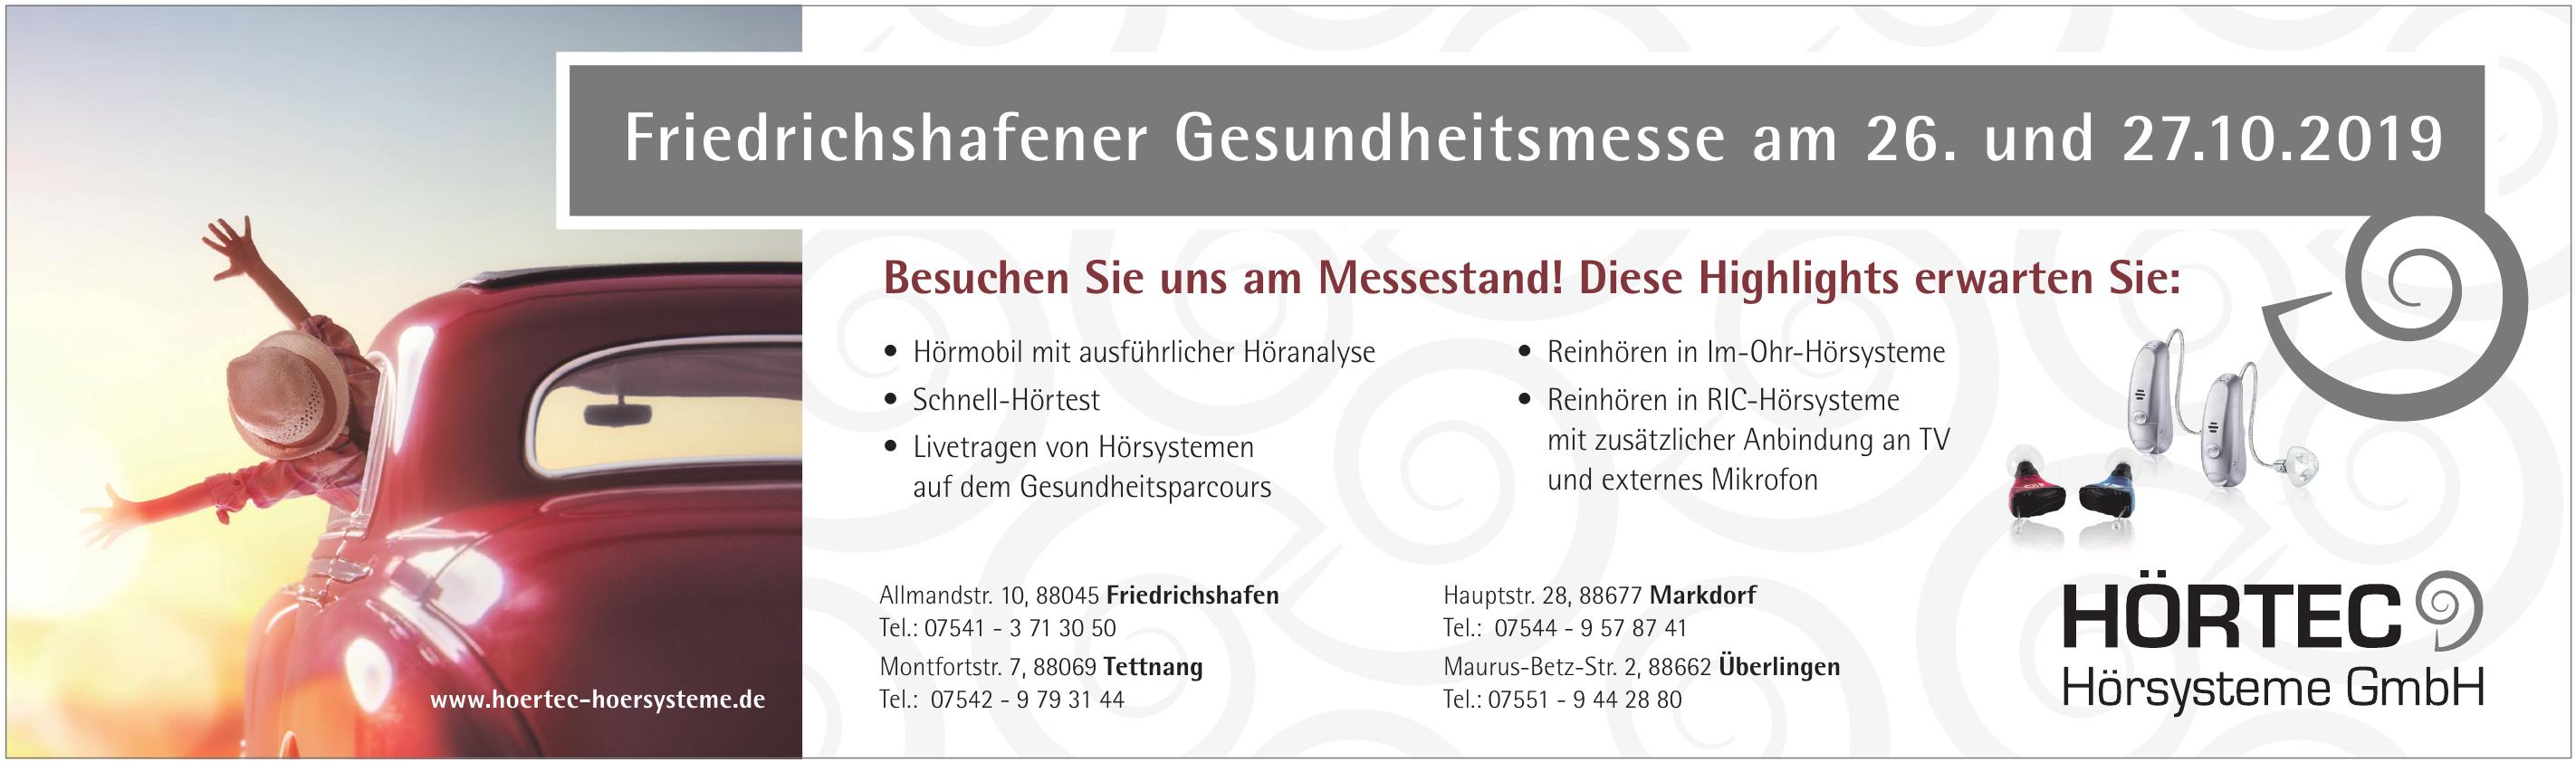 Hörtec Hörsysteme GmbH